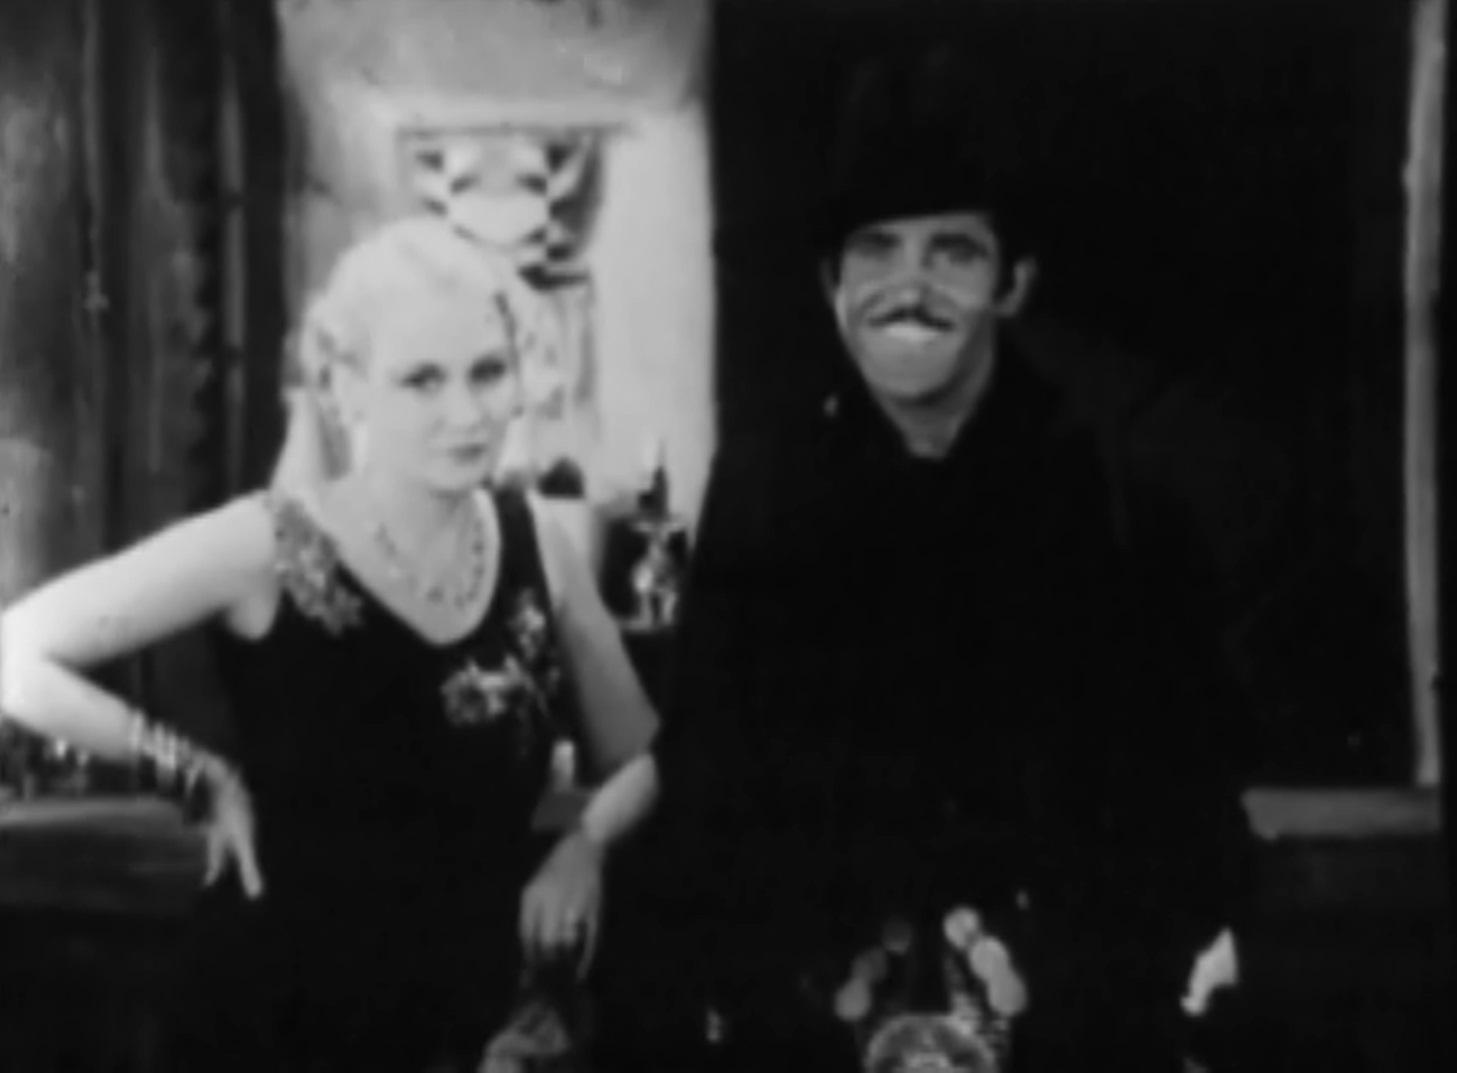 Jeanne Bal,Mildred Davis Sex pics & movies Jacqueline Boatswain,Bianca Ferguson